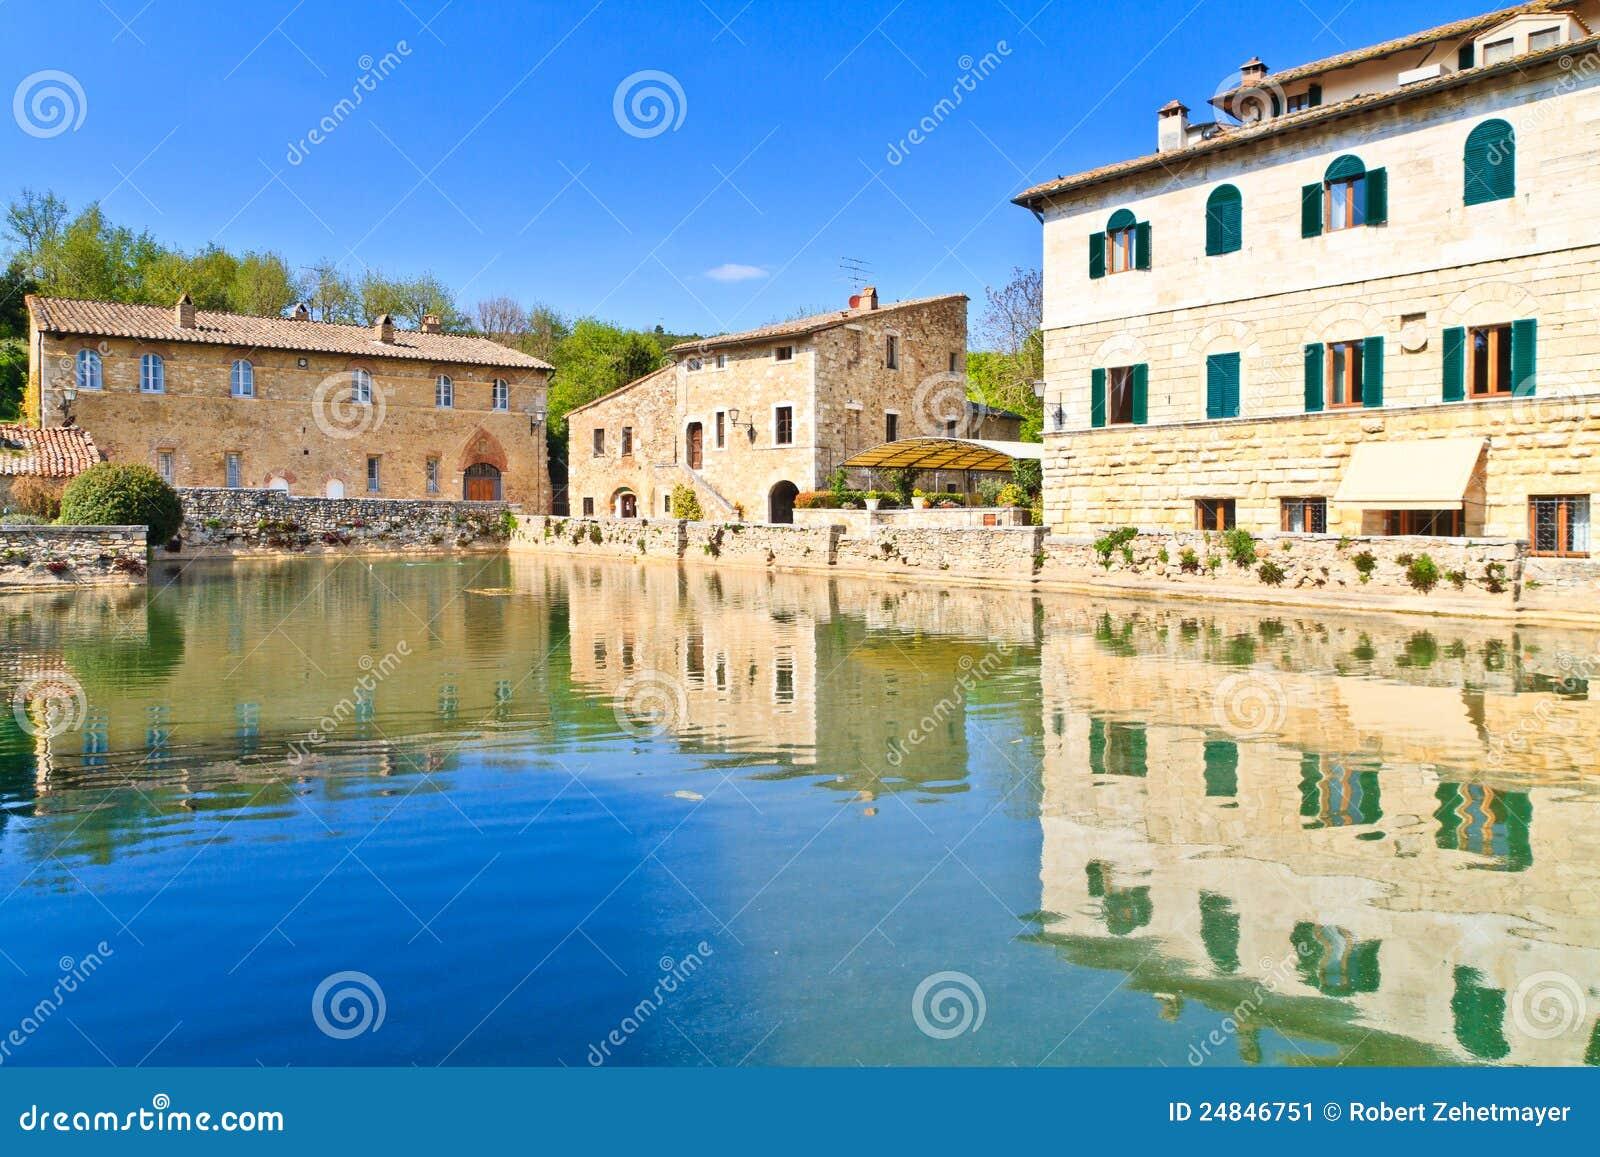 Old Thermal Baths In Bagno Vignoni Stock Image - Image: 24846751